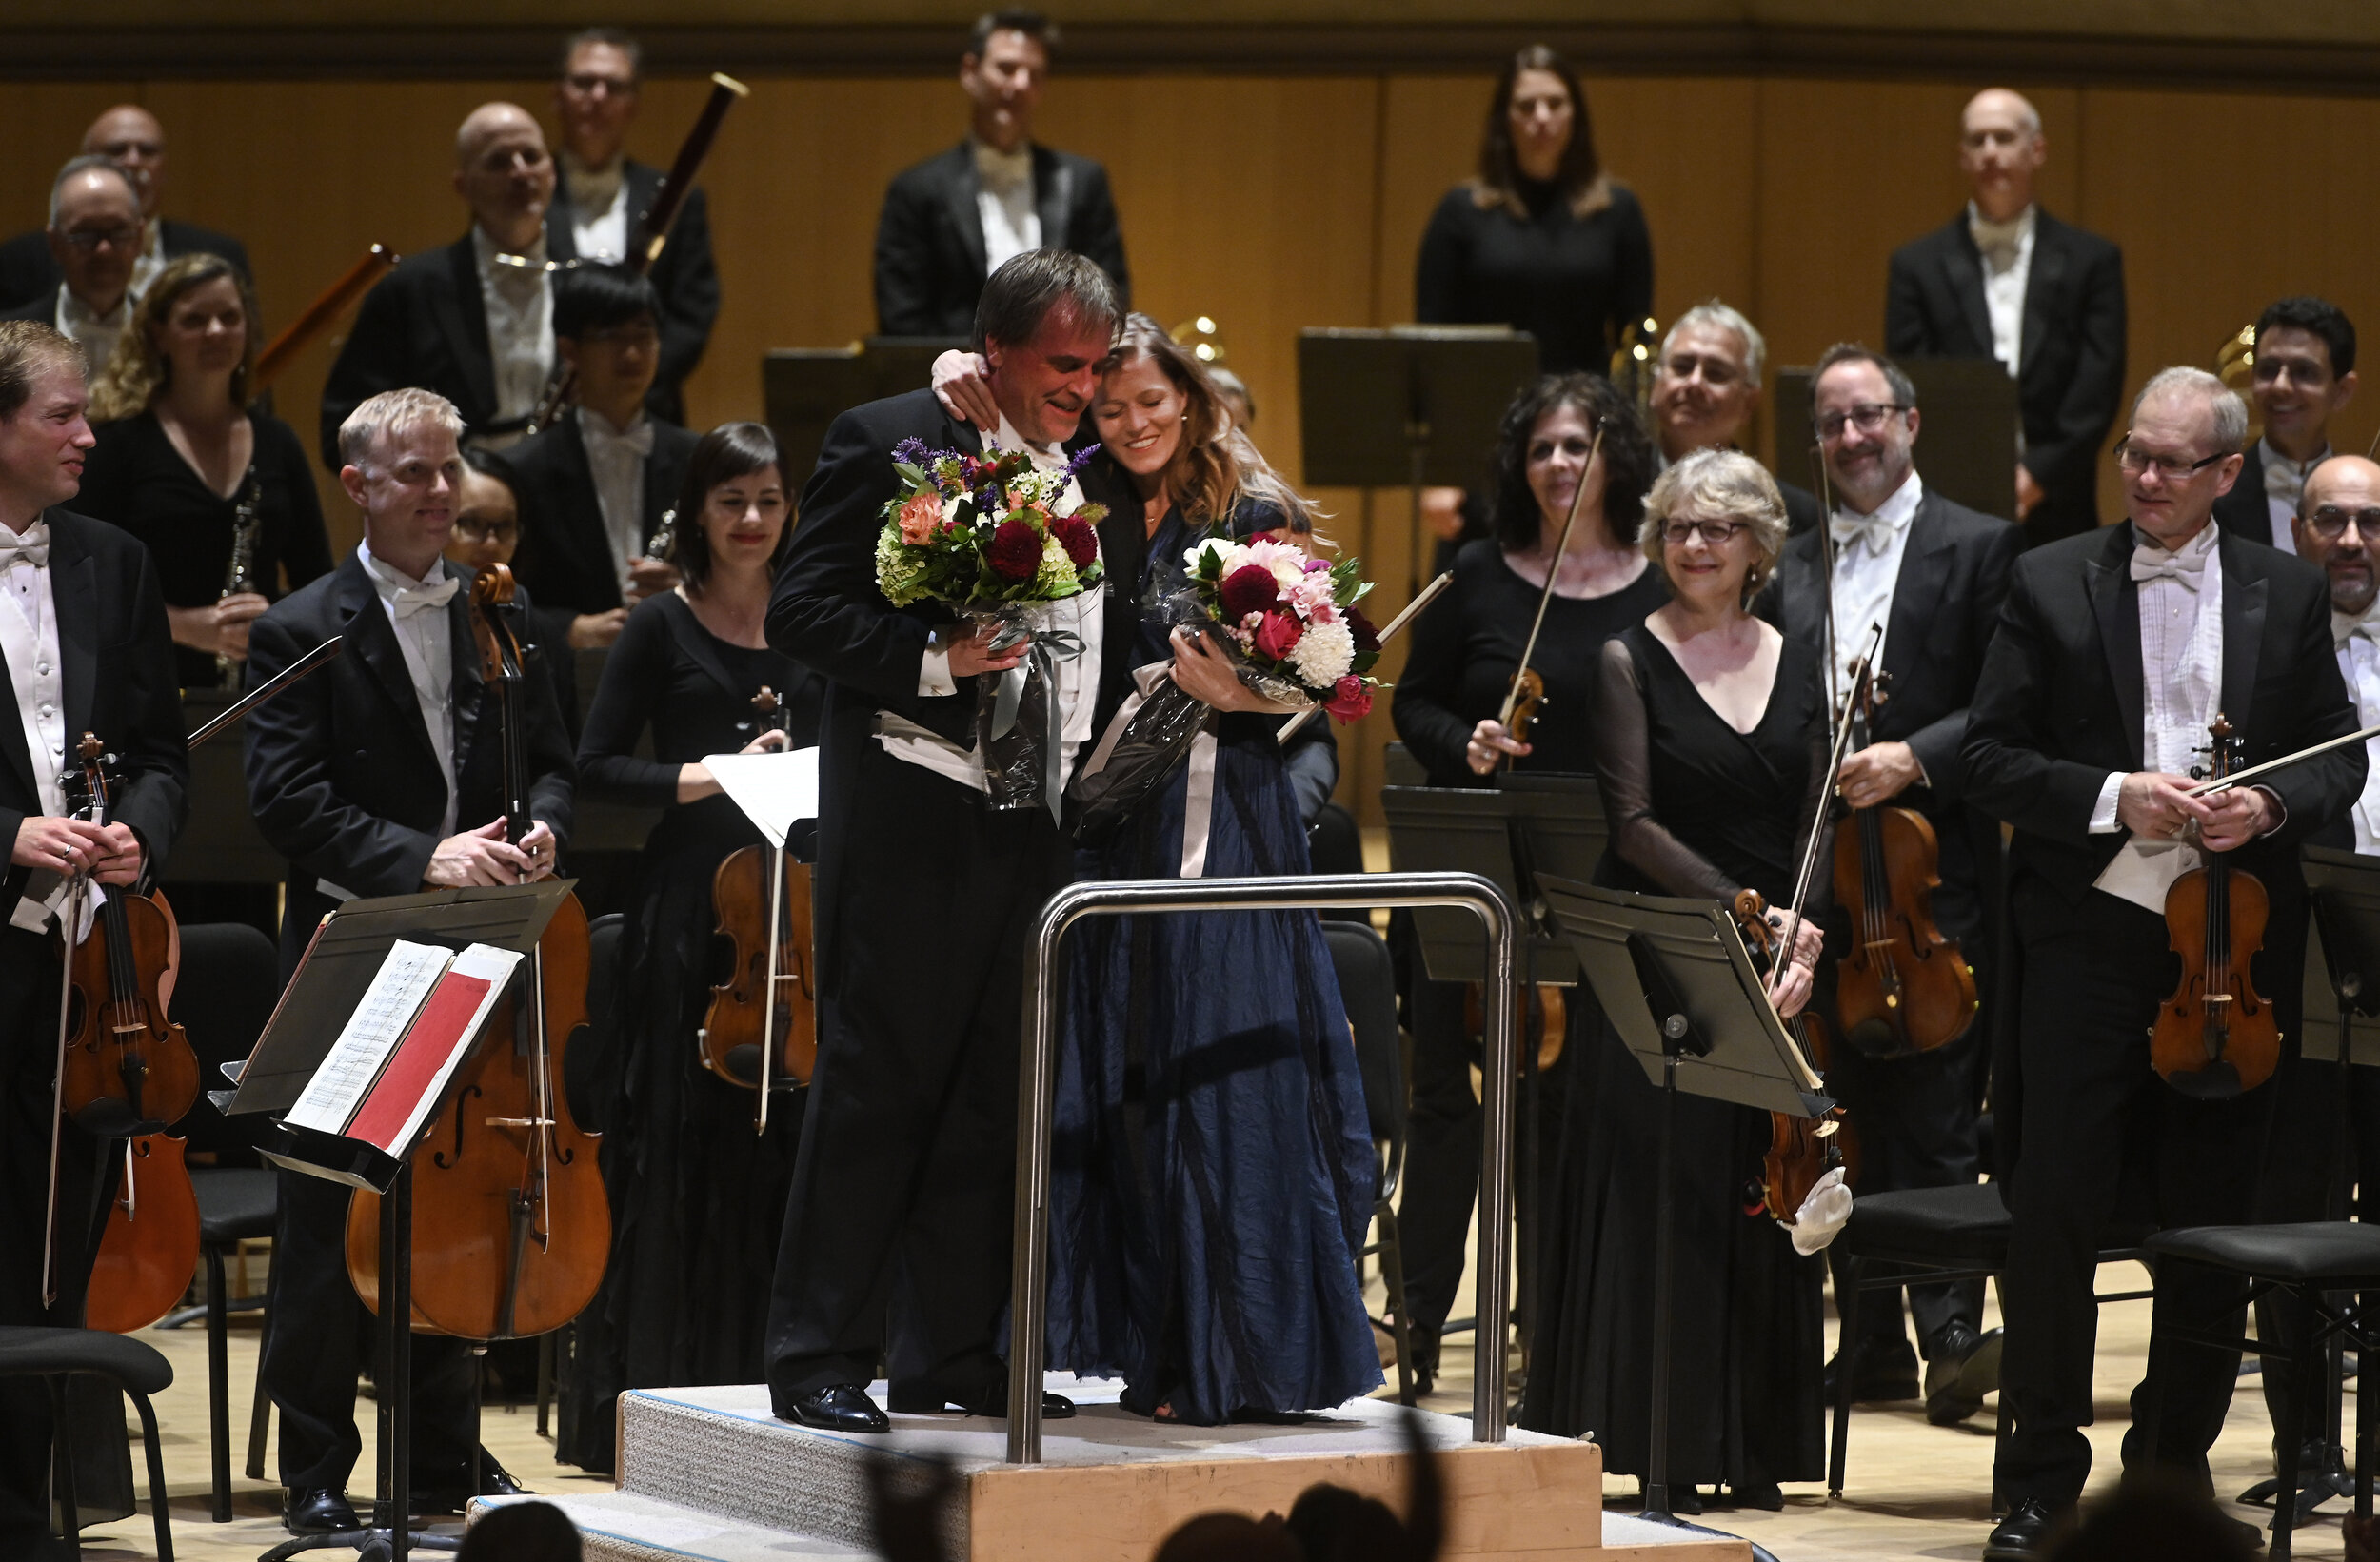 Barbara Hannigan, John Storgårds and the Toronto Symphony Orchestra. Photo by Jag Gundu